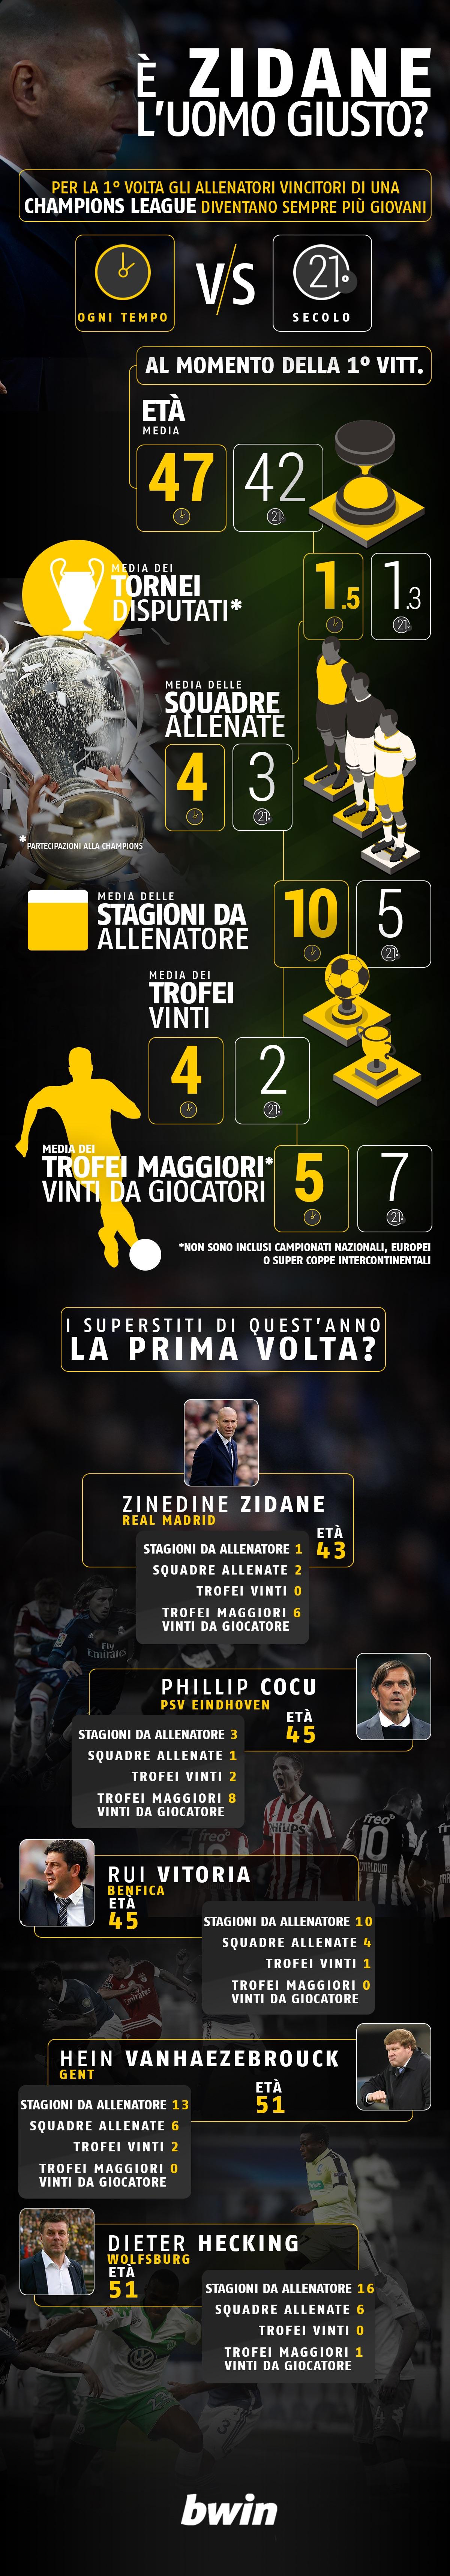 BWIN_Zidane_uomo_giusto